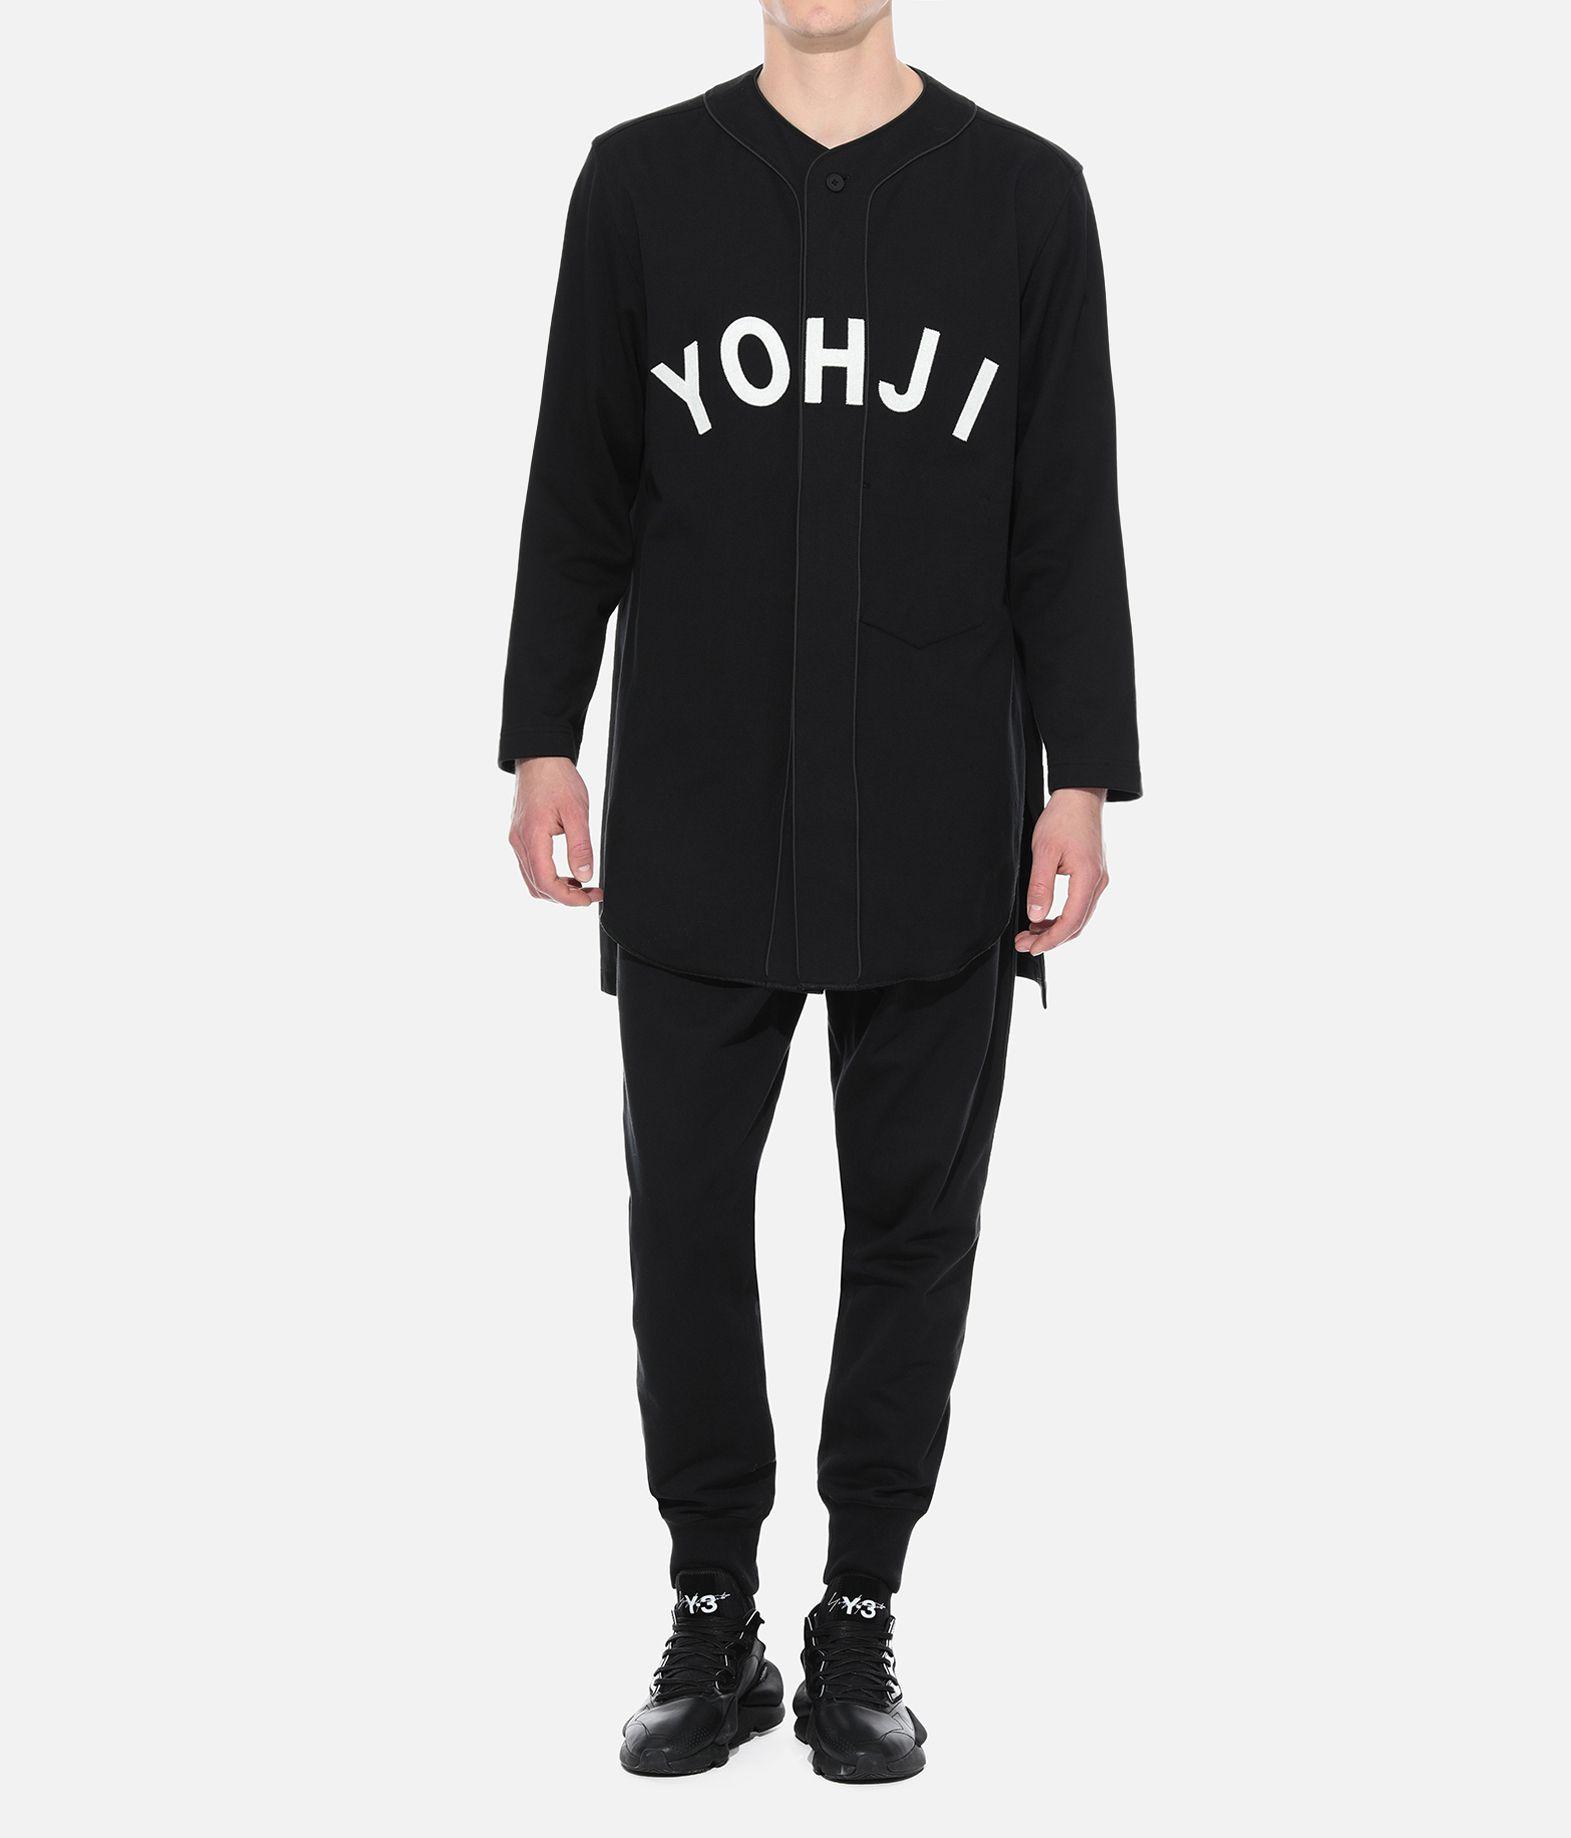 Y-3 Y-3 Yohji Letters Baseball Shirt Sweatshirt Man a